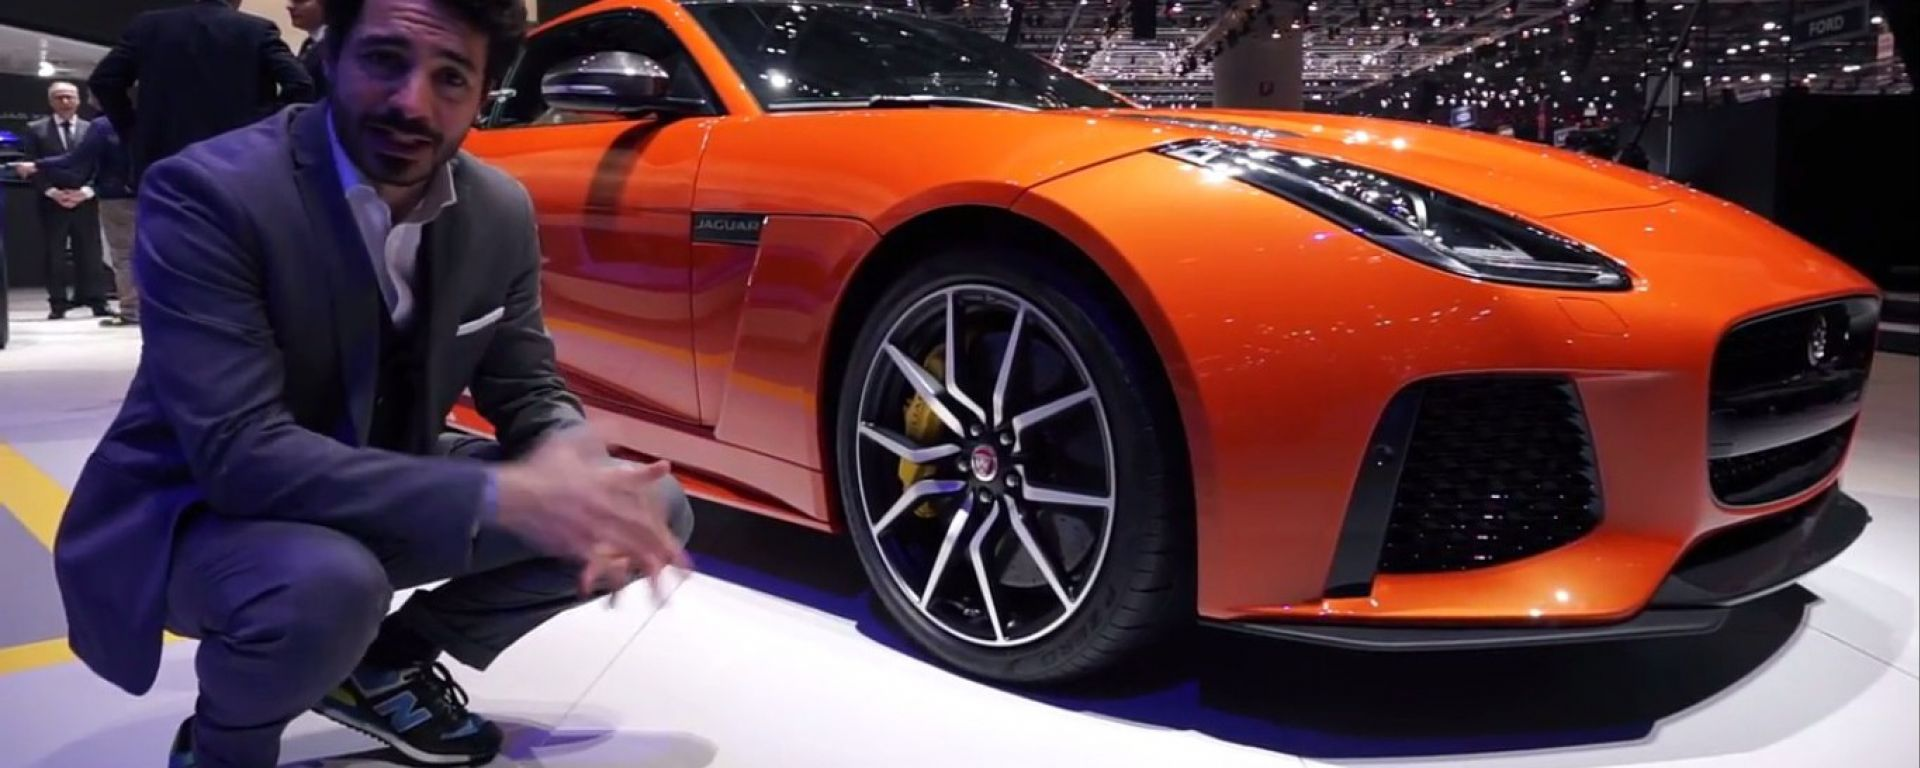 Ginevra 2016: lo stand Jaguar e Land Rover